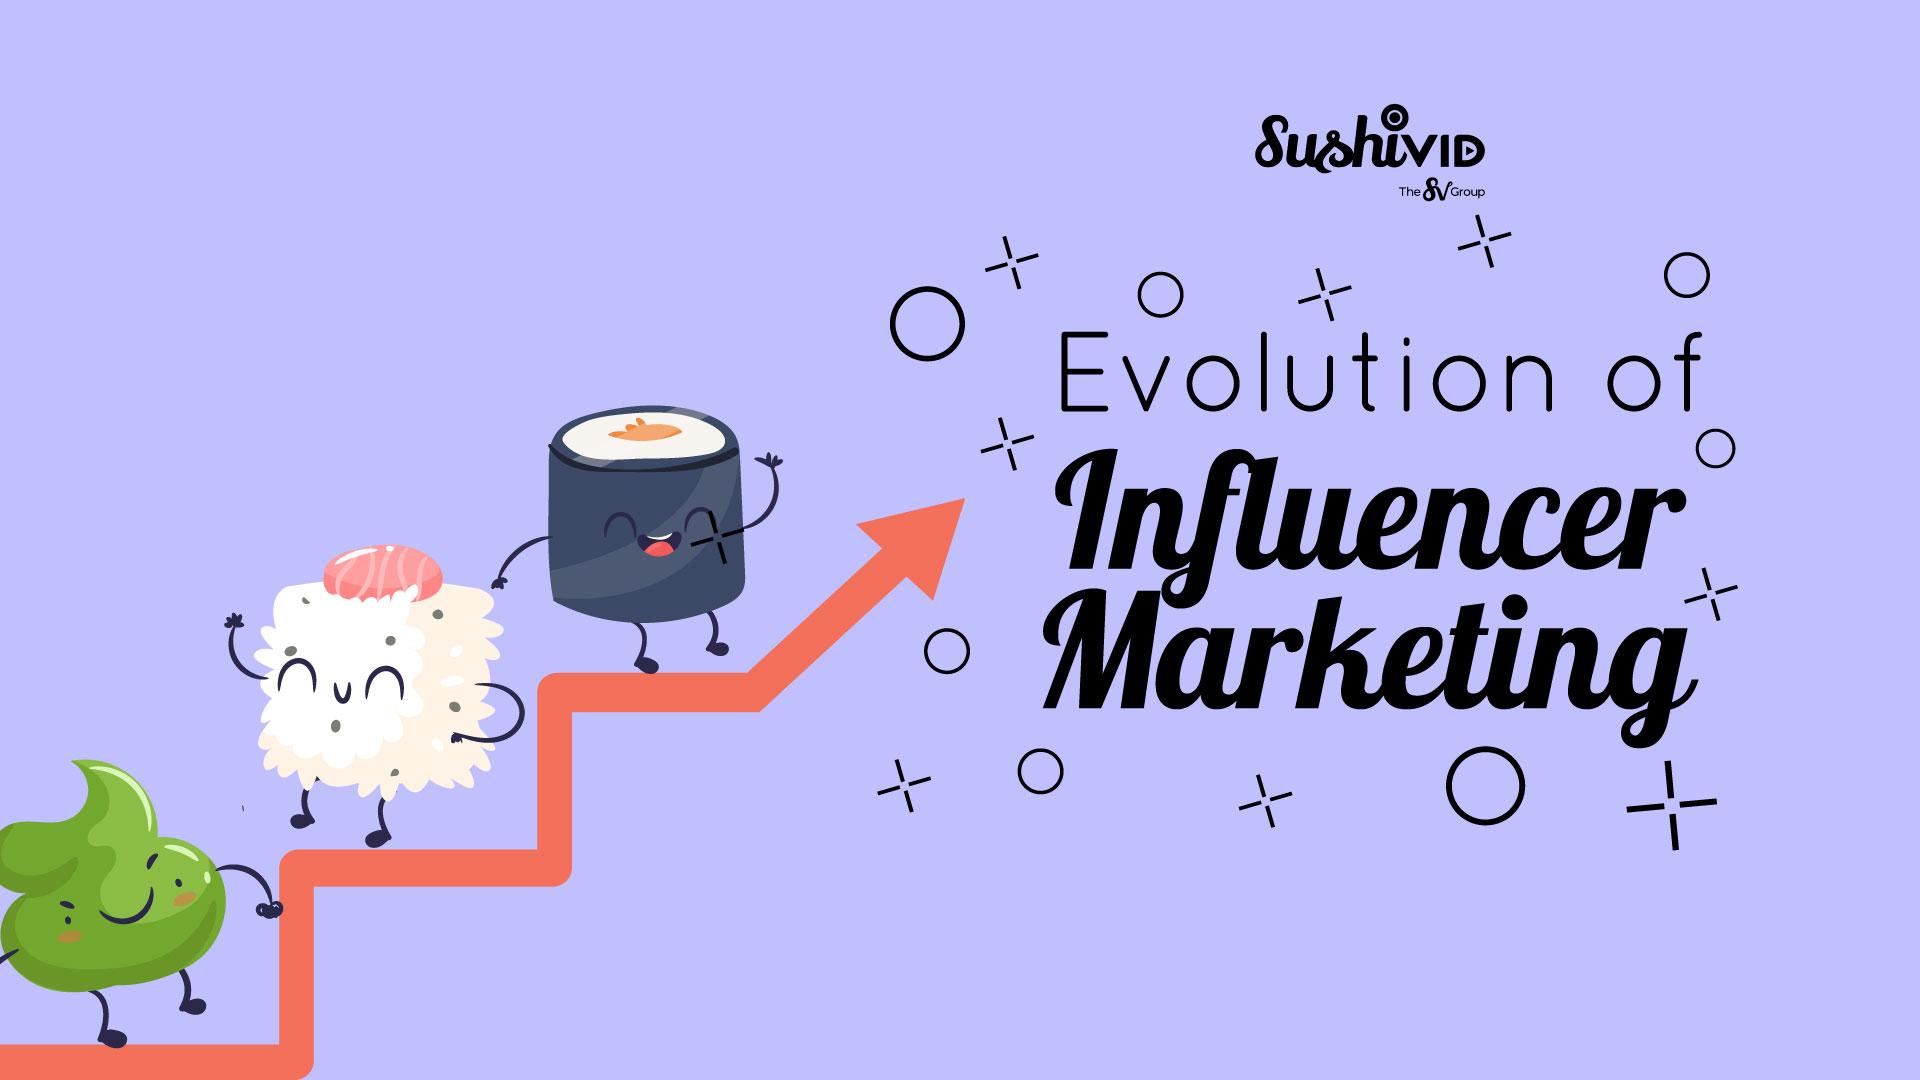 Evolution of influencer marketing